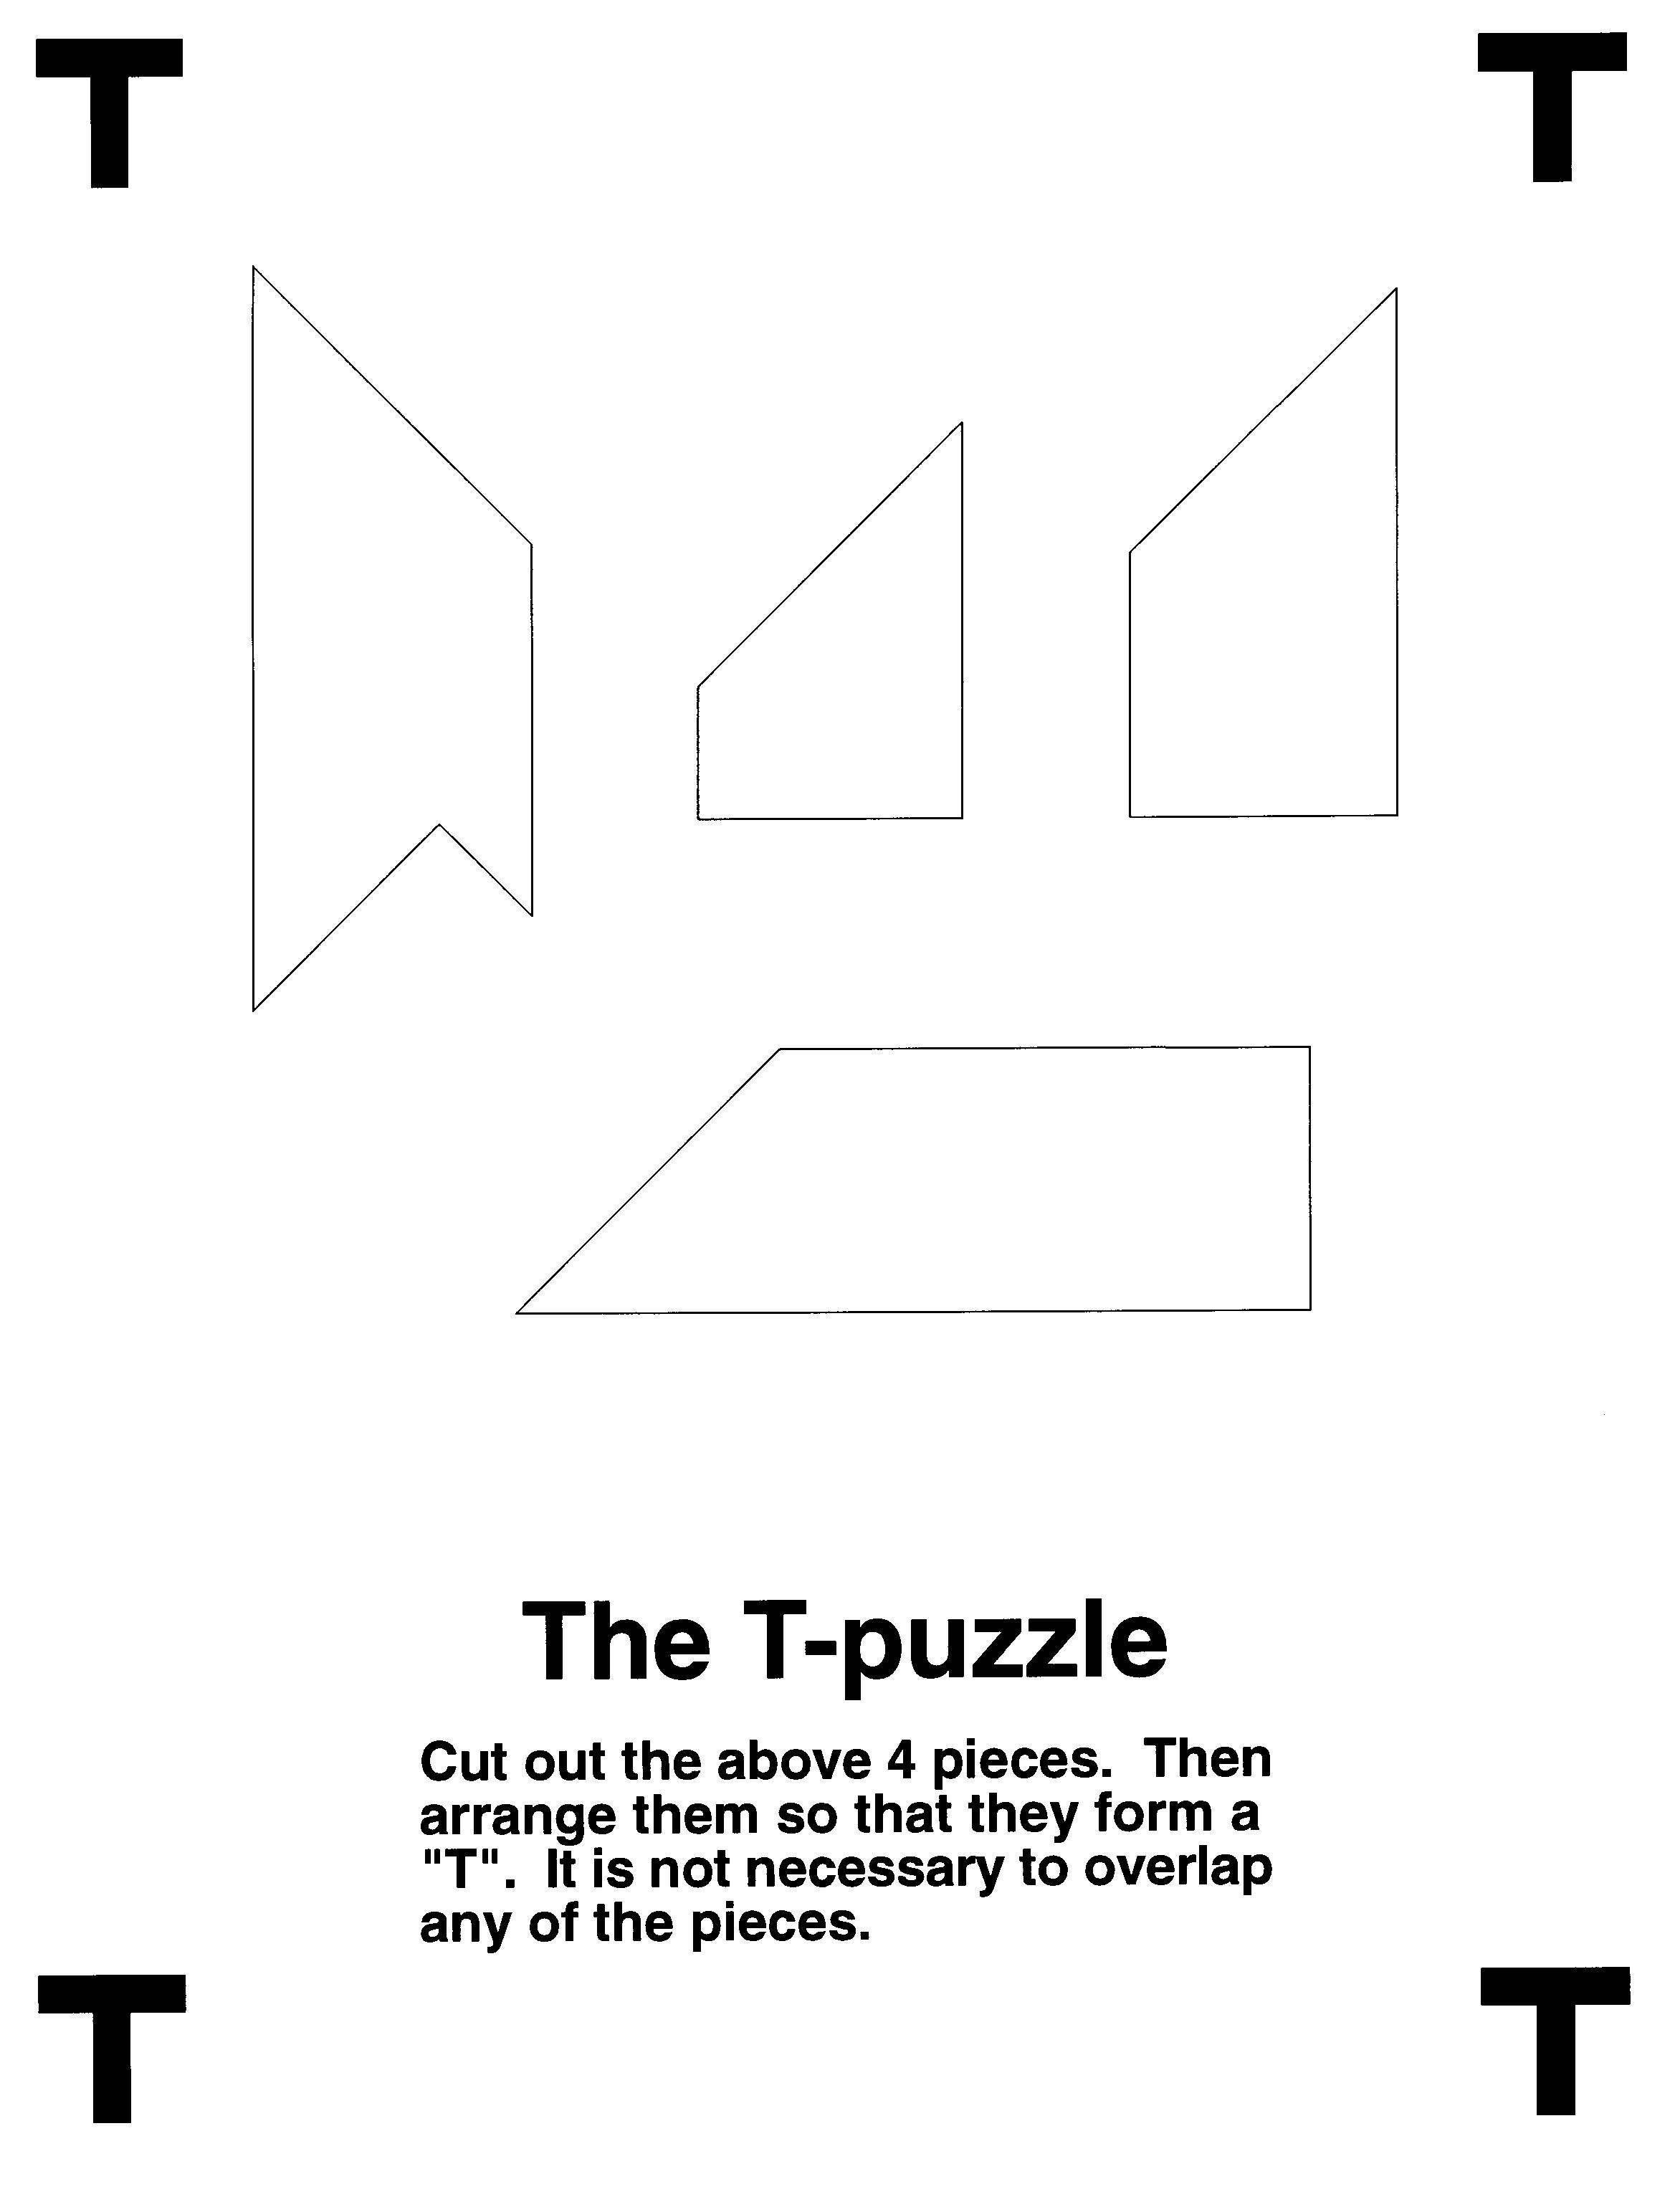 Diy Puzzles | Puzzles.ca - Printable T Puzzle